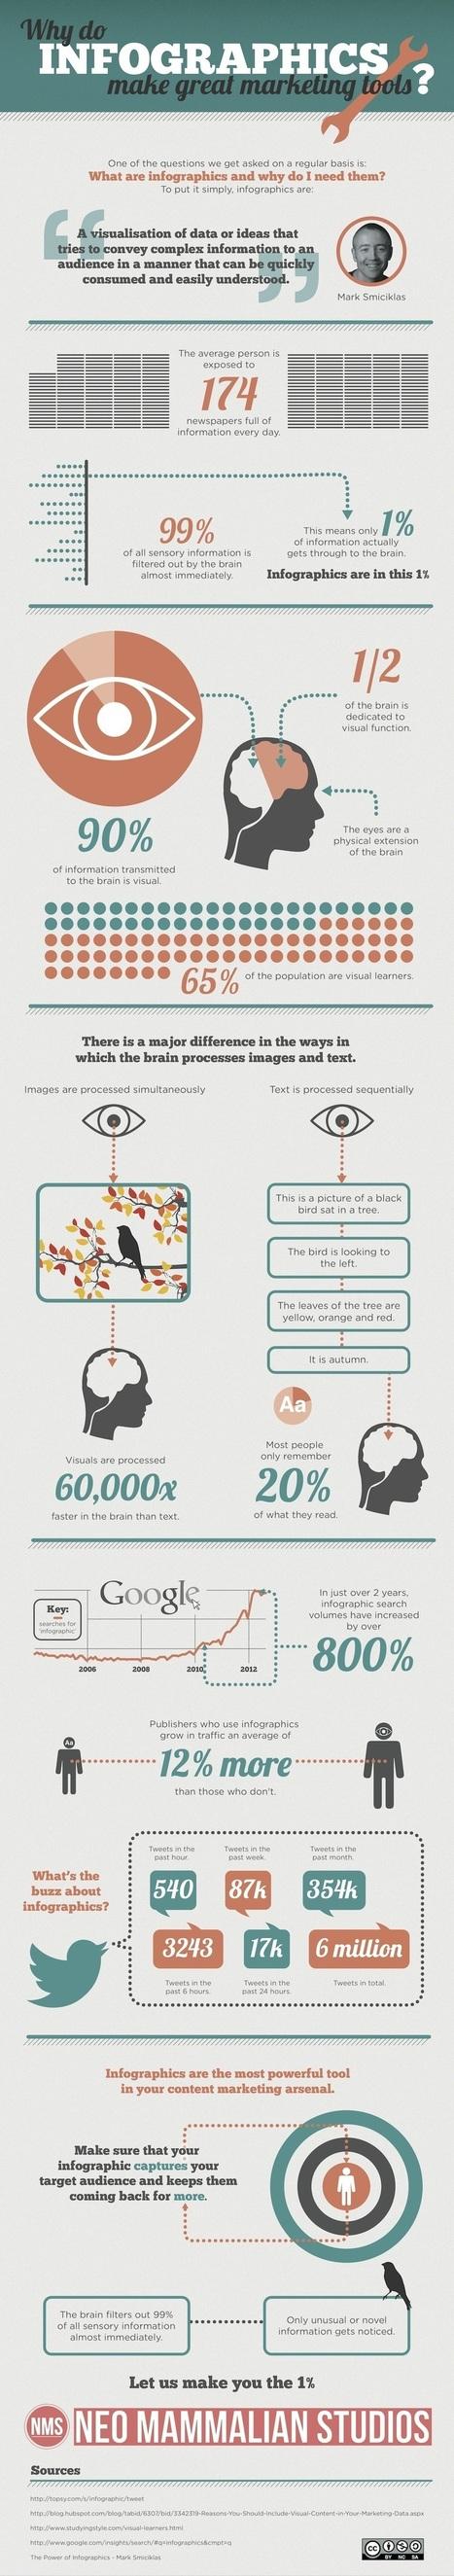 Eine Infografik über Infografiken im Marketing | Social Media in Public Relations | Scoop.it